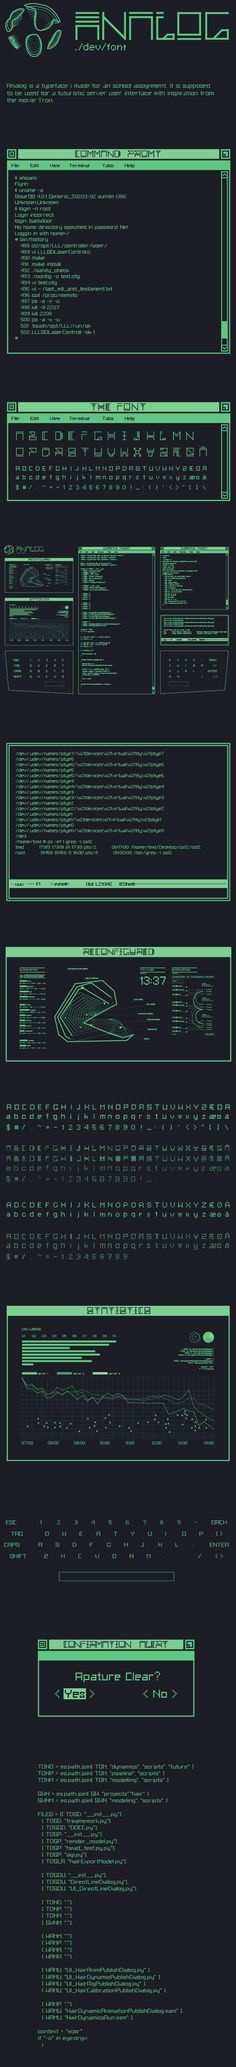 Analog Font by Jonatan Austigard, via Behance